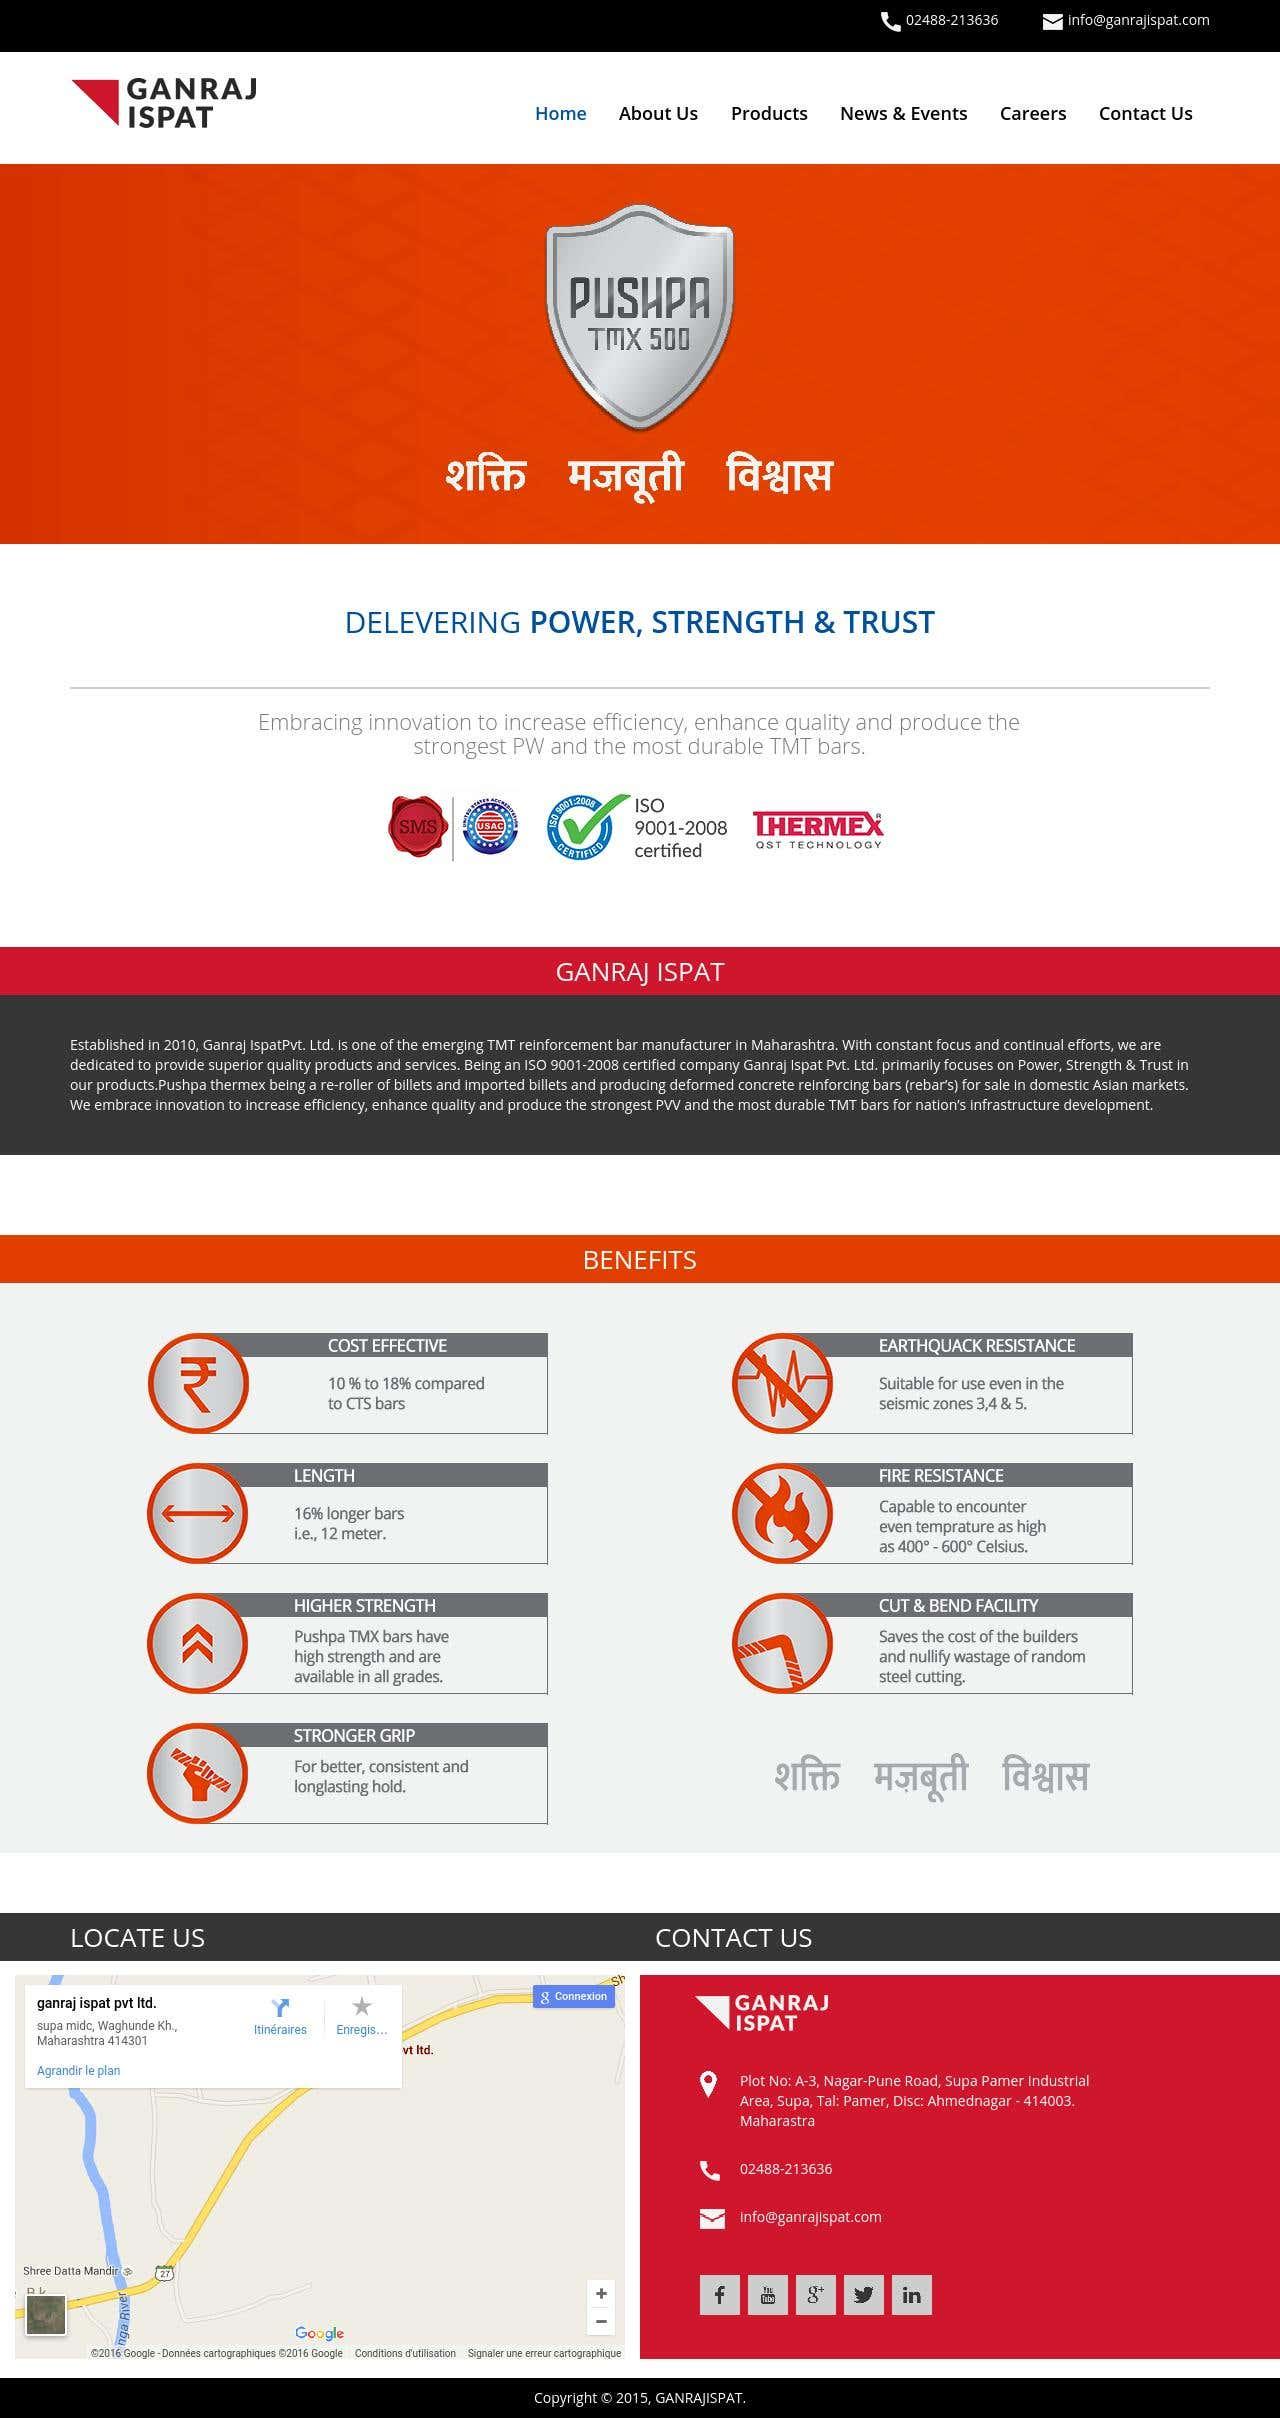 Website for Pushpa tmx500